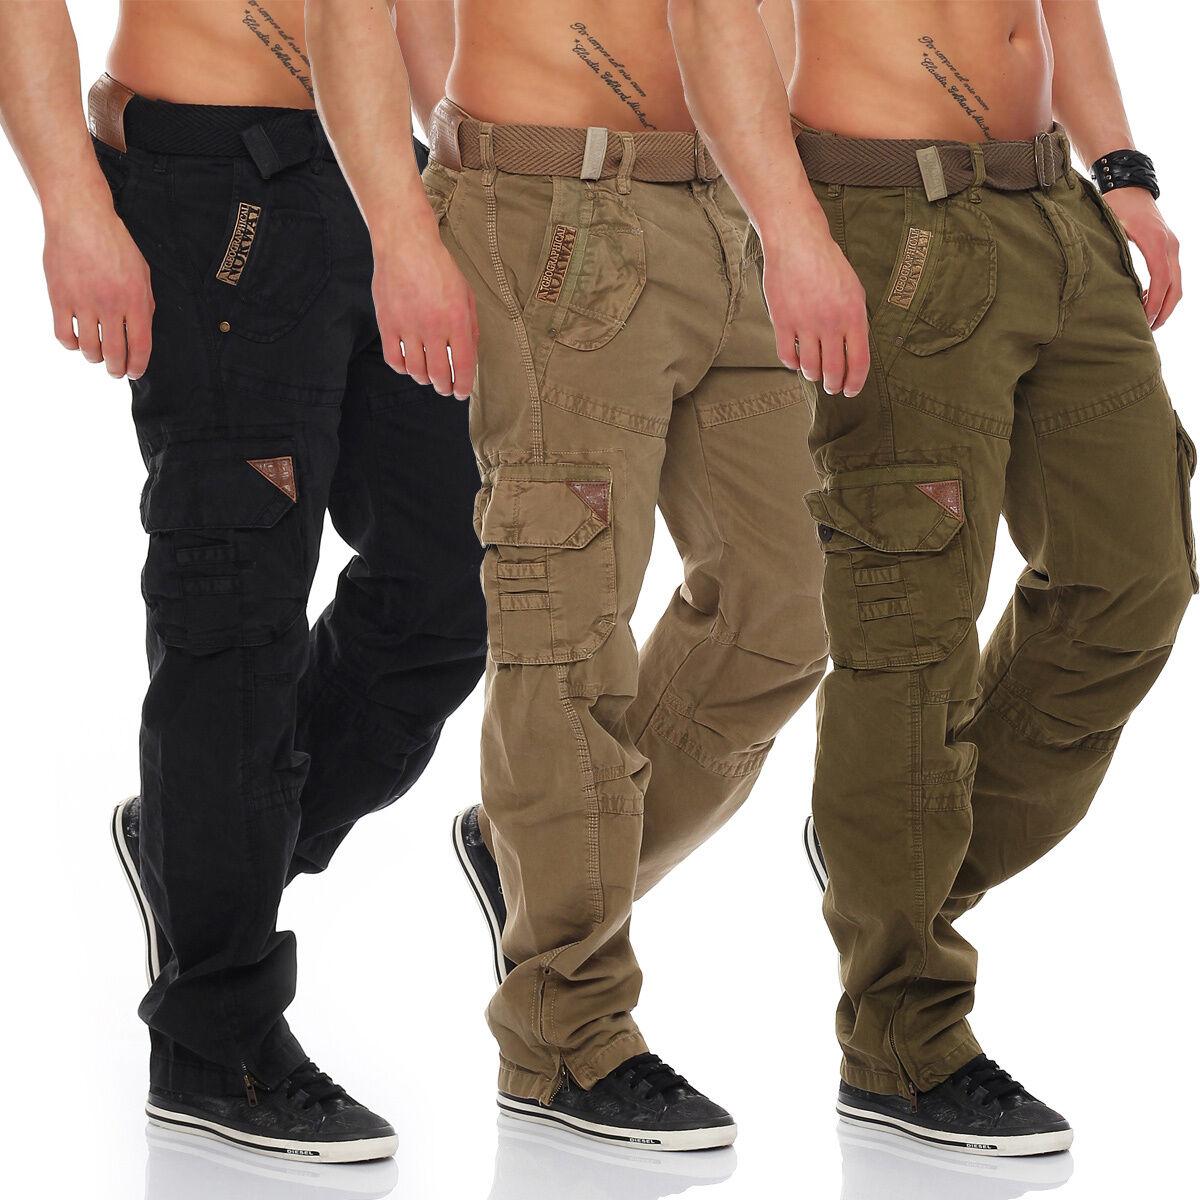 Geographical Norway Uomo Pantaloni Cargo Shorts Pantaloni Uomo ARMY tempo libero cargopants